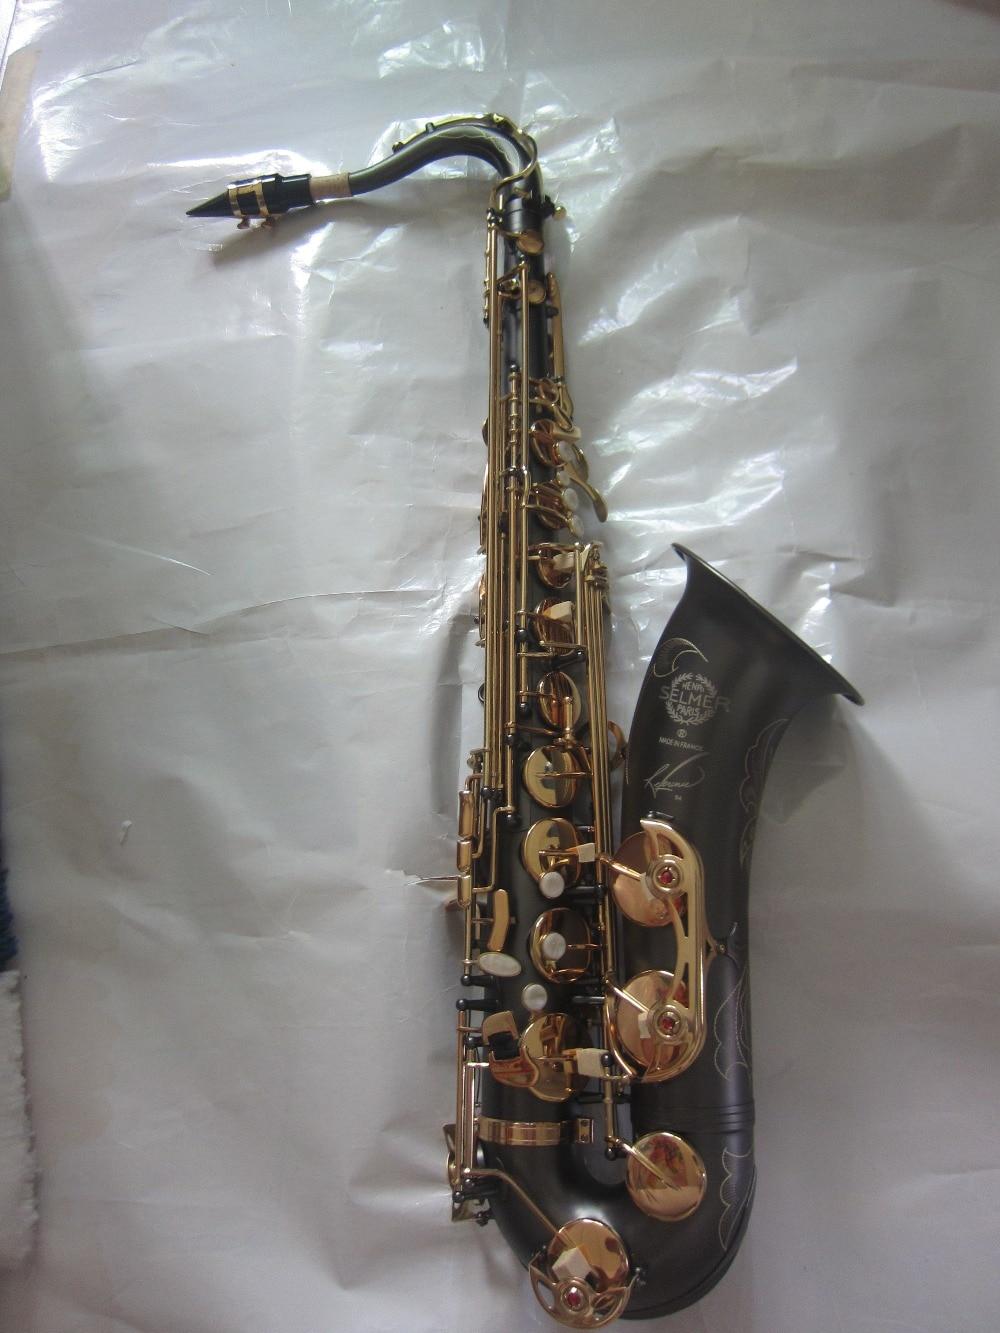 tenor saxophone Free delivery SELMER 54 Sax drop B. Matt black Gold bond Saxophone instrument france henri selmer bb tenor saxophone instruments reference 36 drop b saxophone surface gold lacquer pink body professional sax